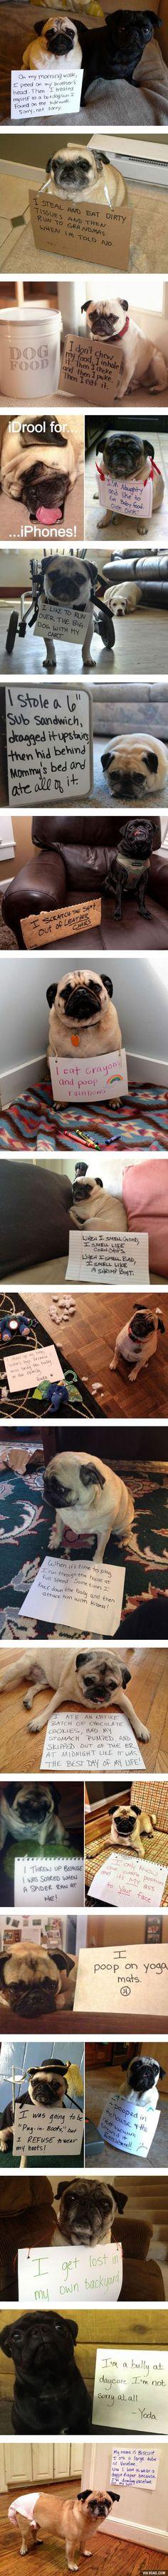 dog shaming - pug compilation: